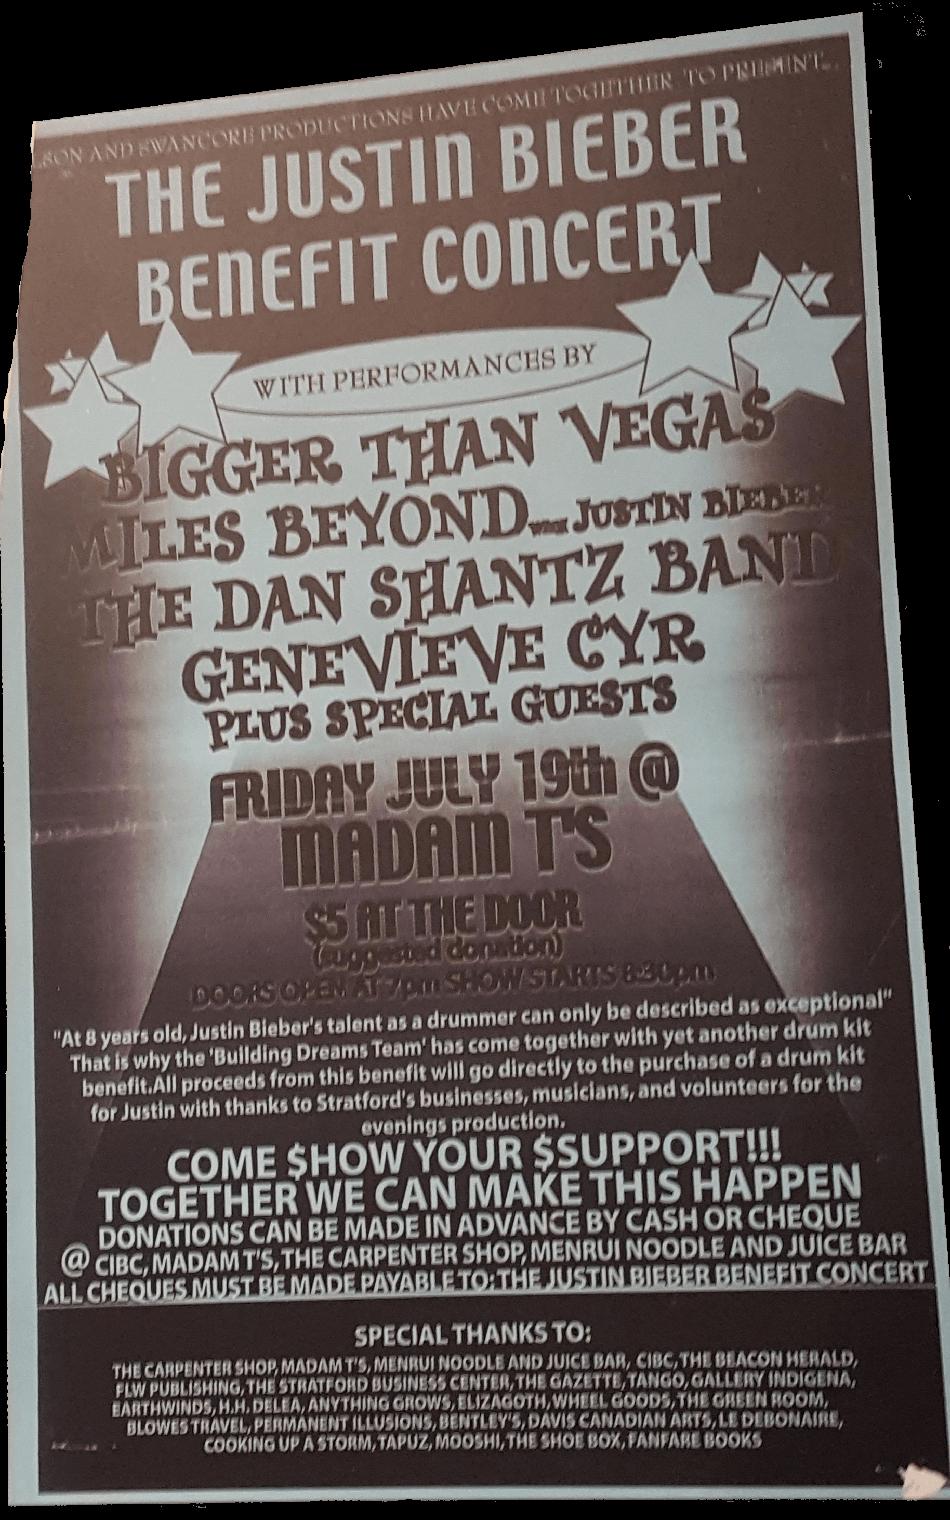 Justin-Bieber-Exhibit-museum-drum kit fundraisingPoster-stratford.